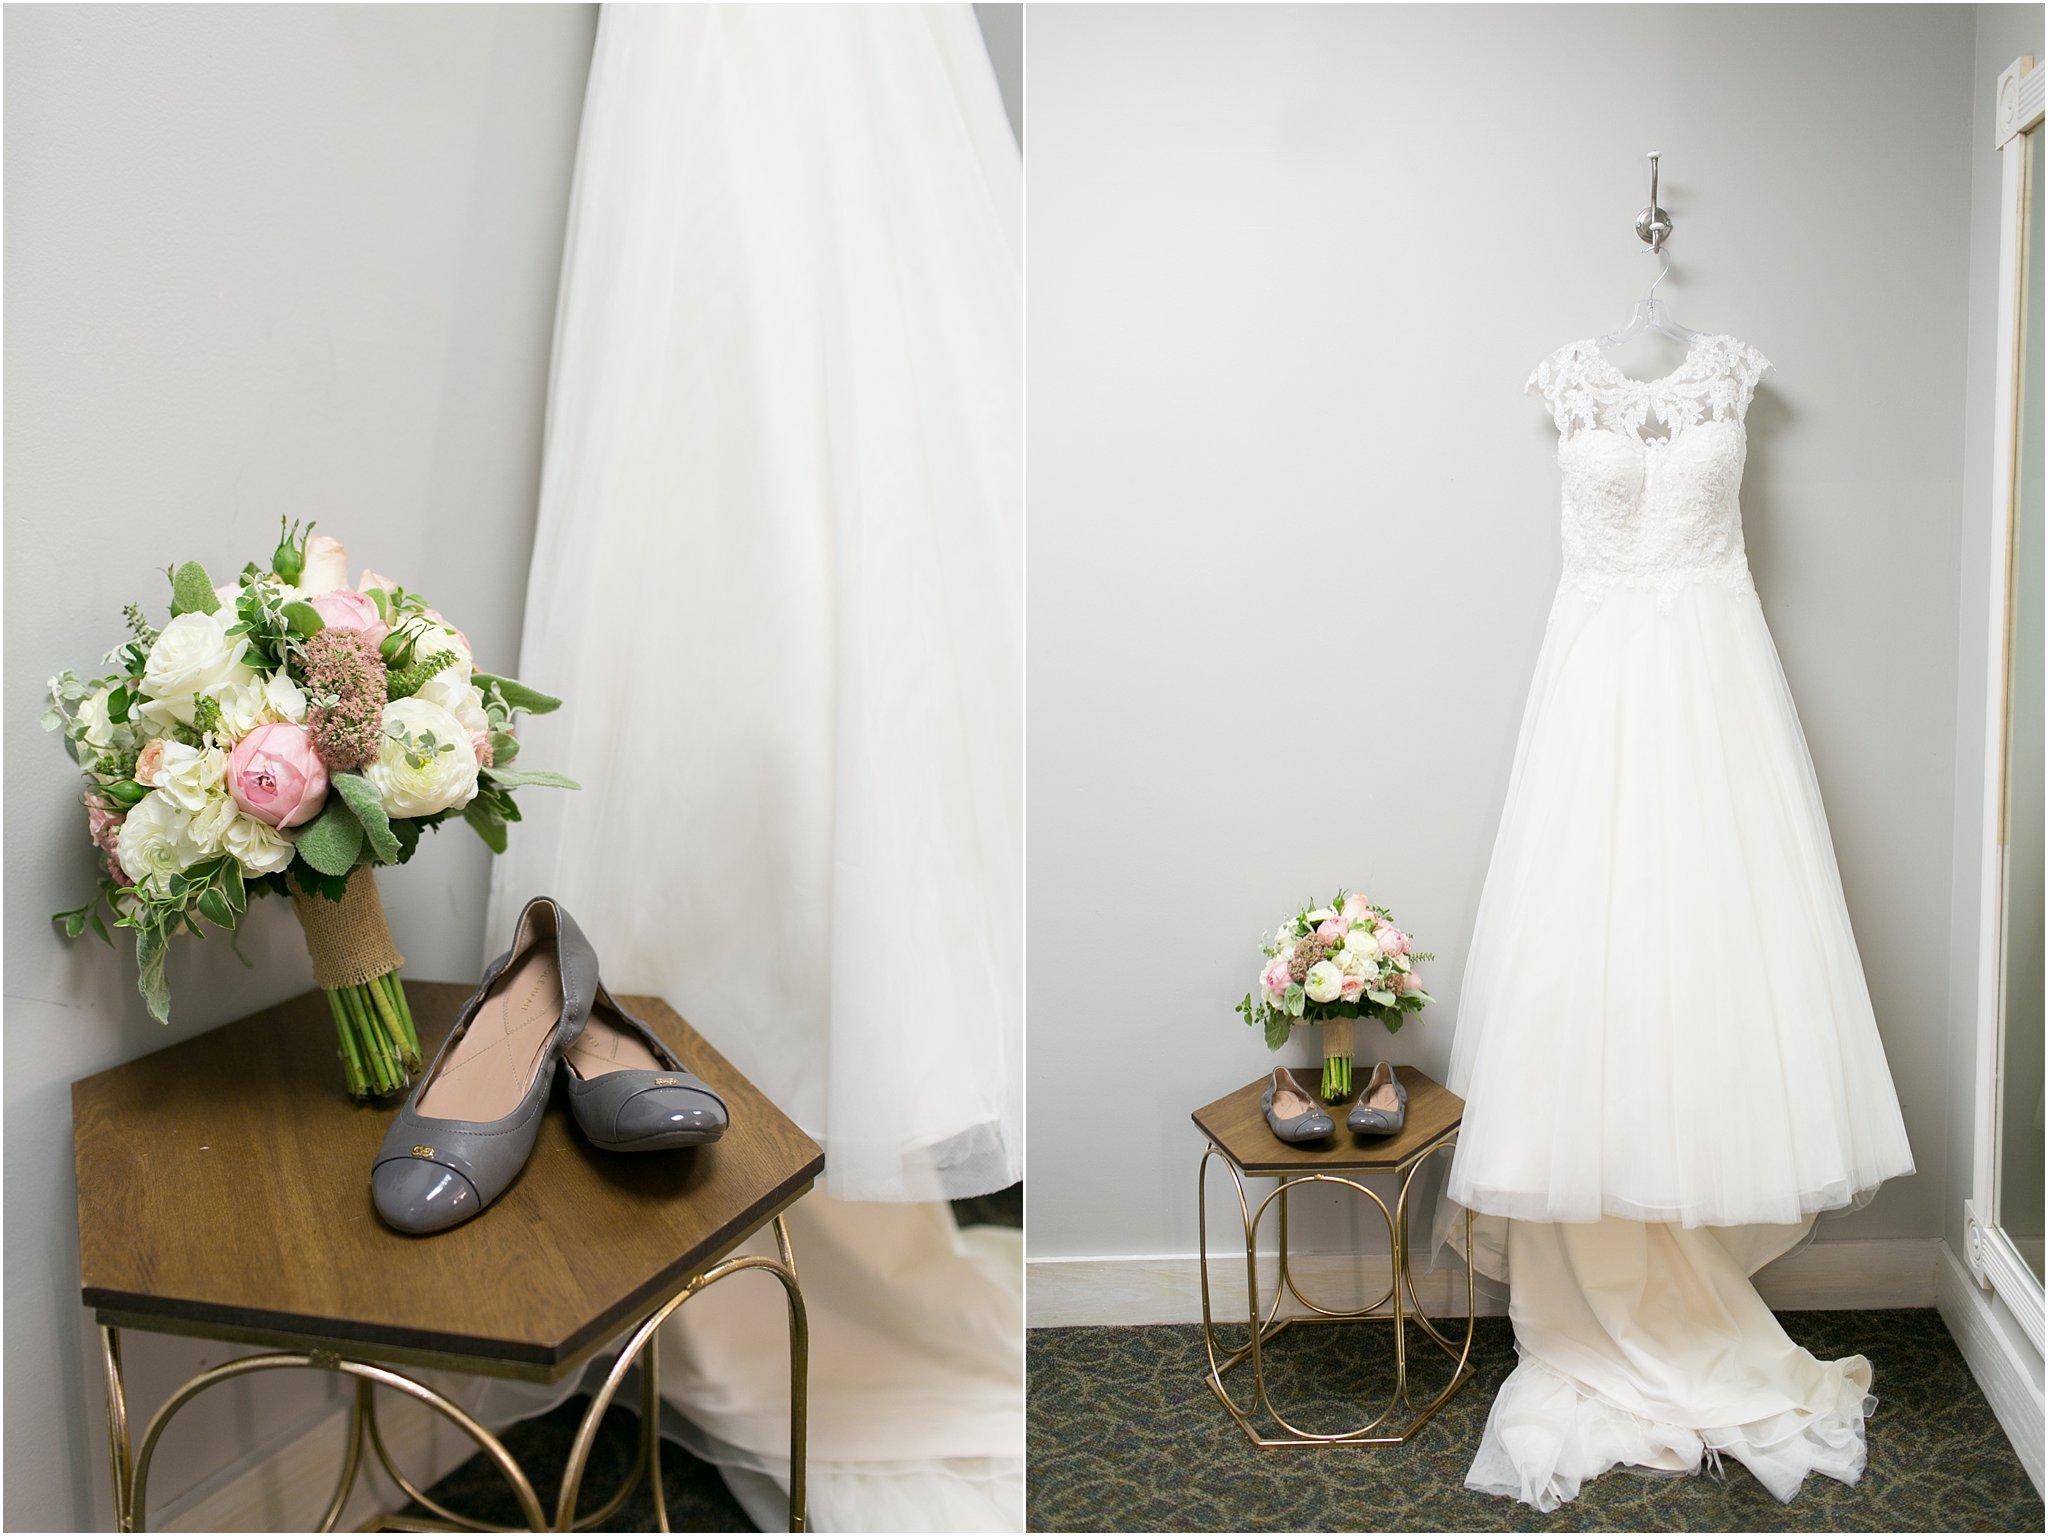 jessica_ryan_photography_virginia_wedding_photographer_wedding_hurricane_norfolk_botanical_gardens_hurricane_matthew_wedding_3541